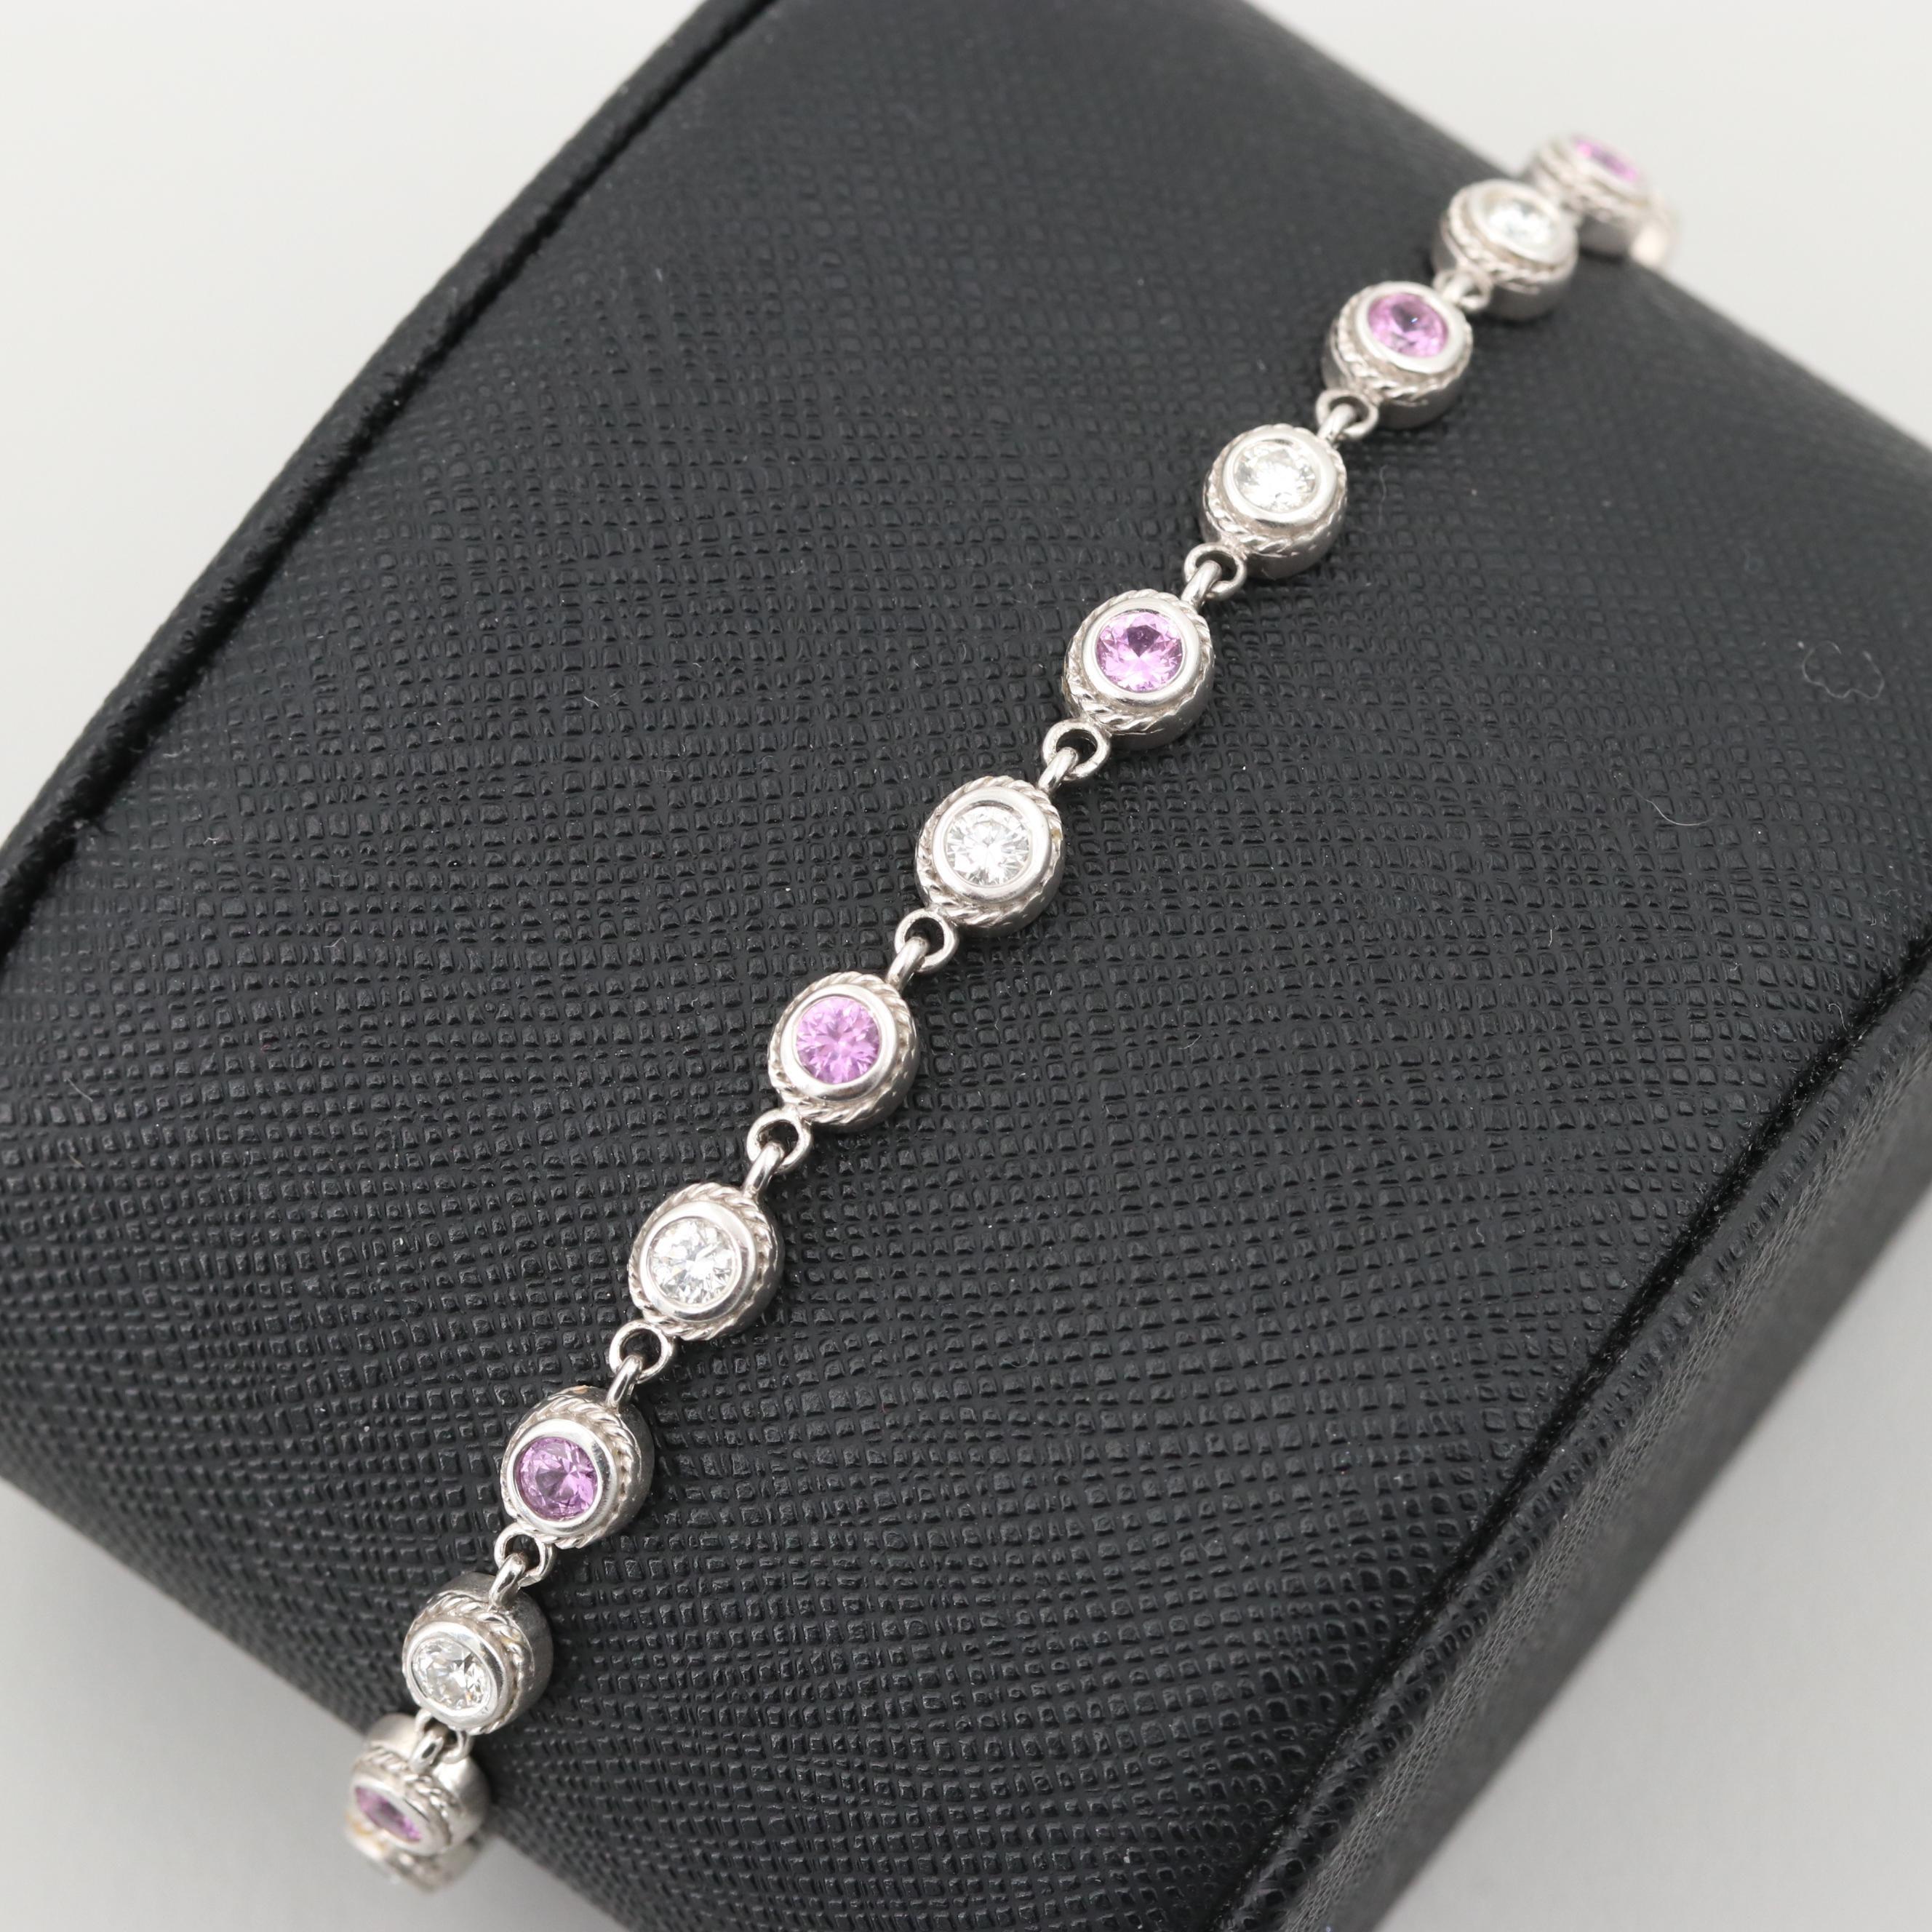 18K White Gold 1.44 CTW Diamond and Pink Sapphire Line Bracelet